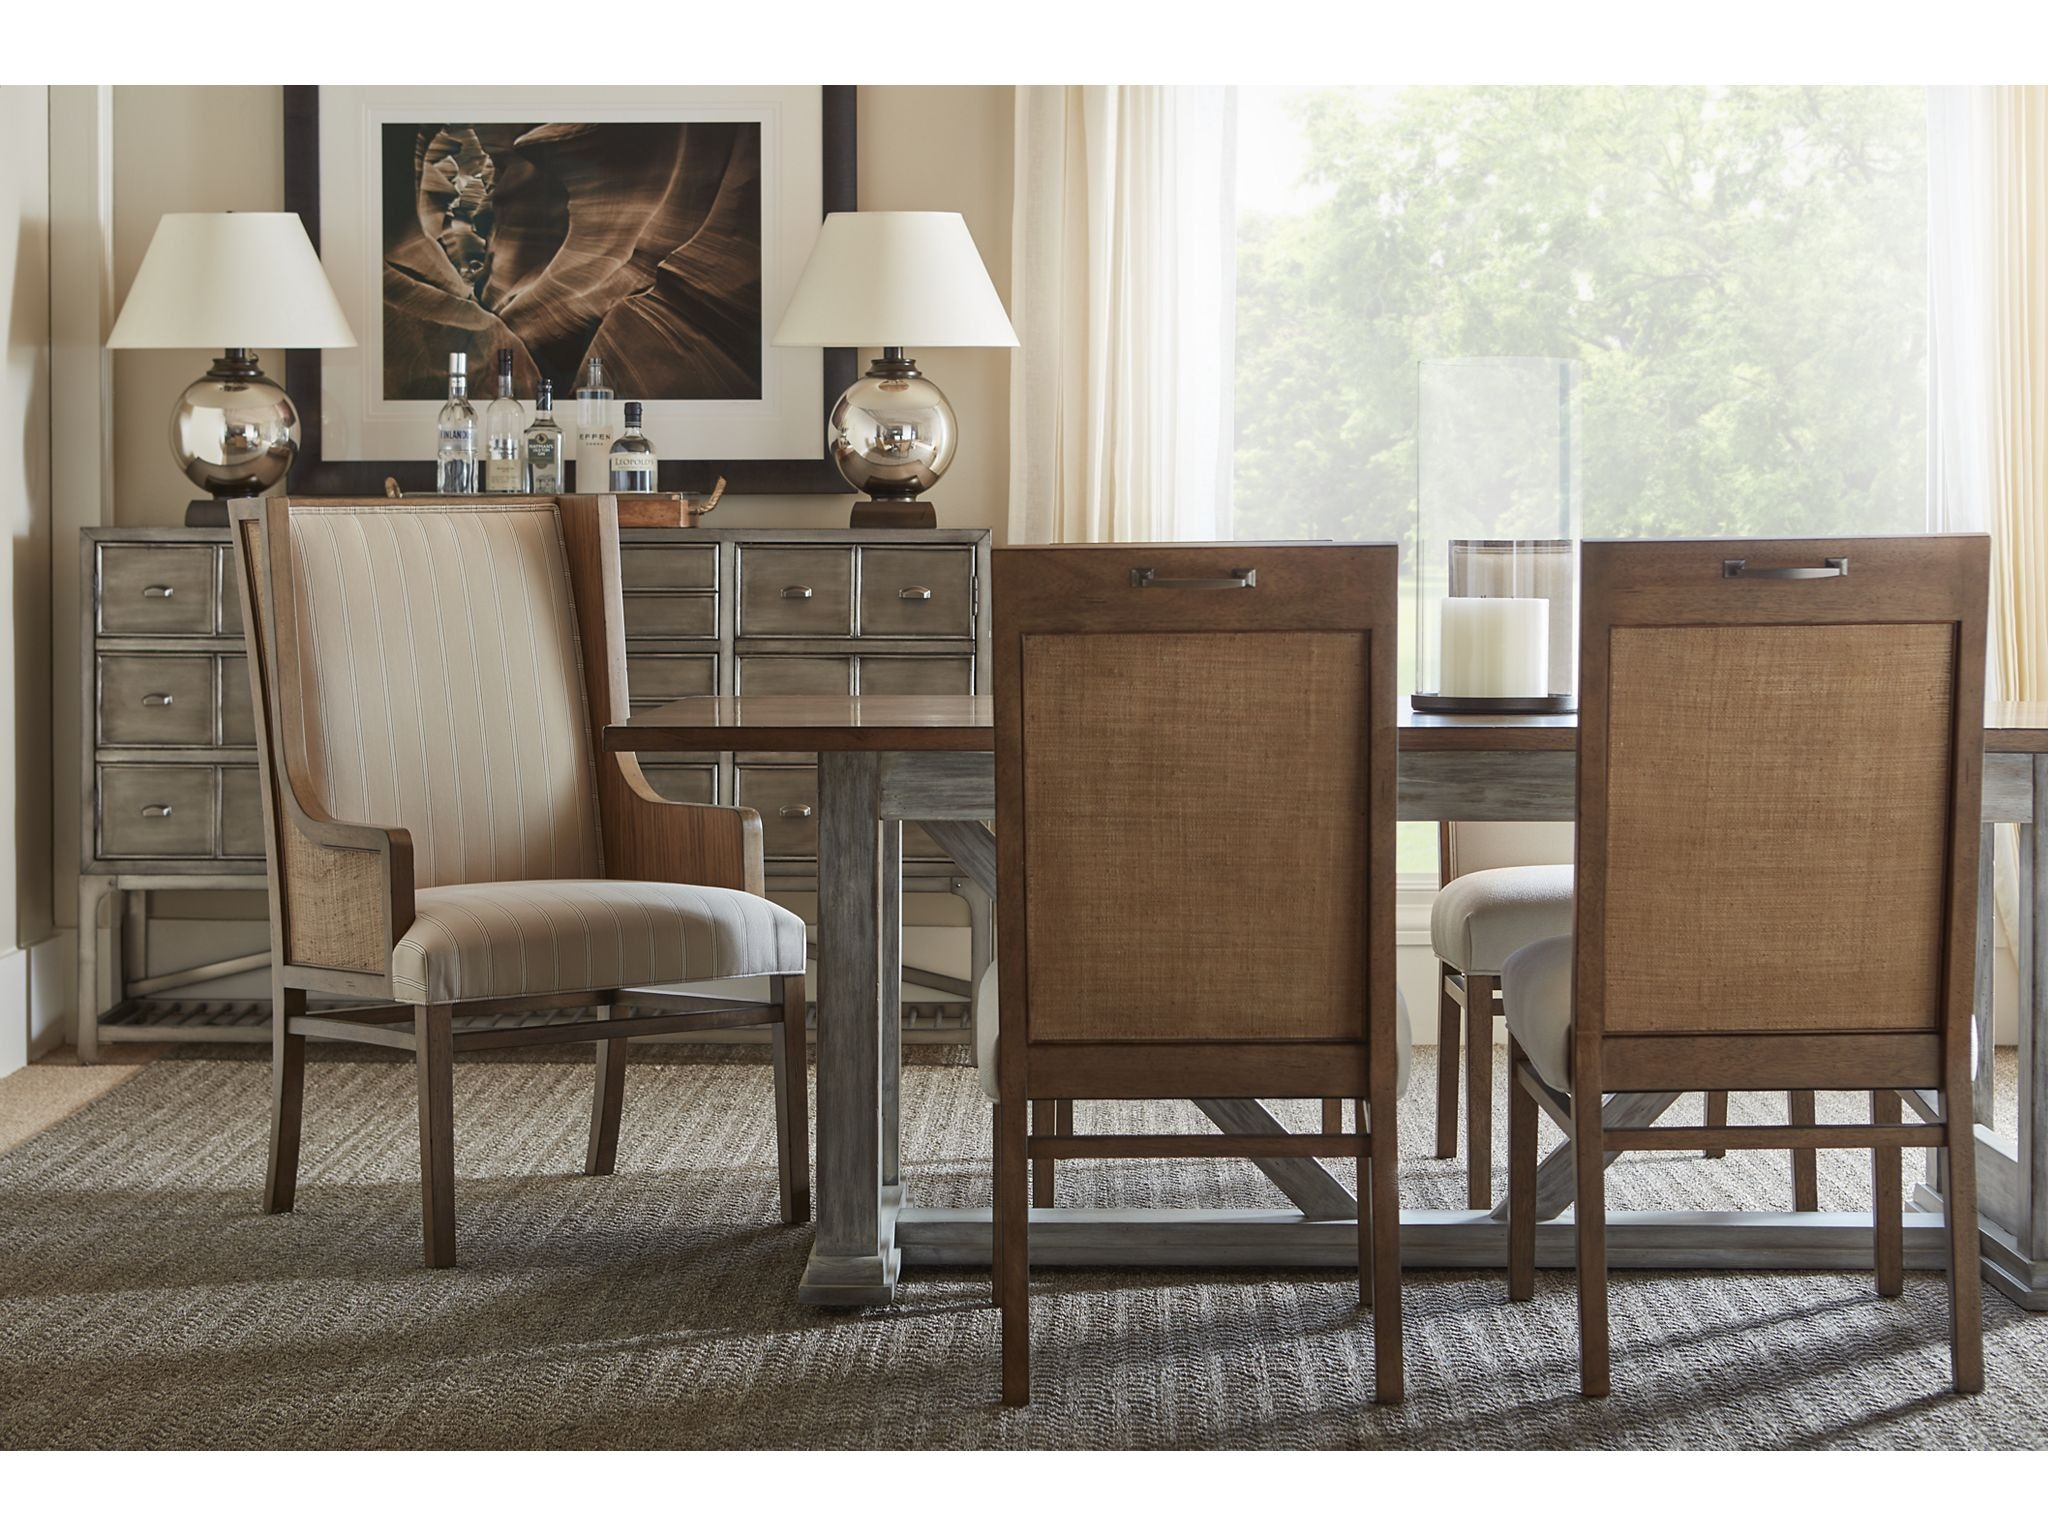 Drexel Furniture Montauk Trestle Dining Table 325 660